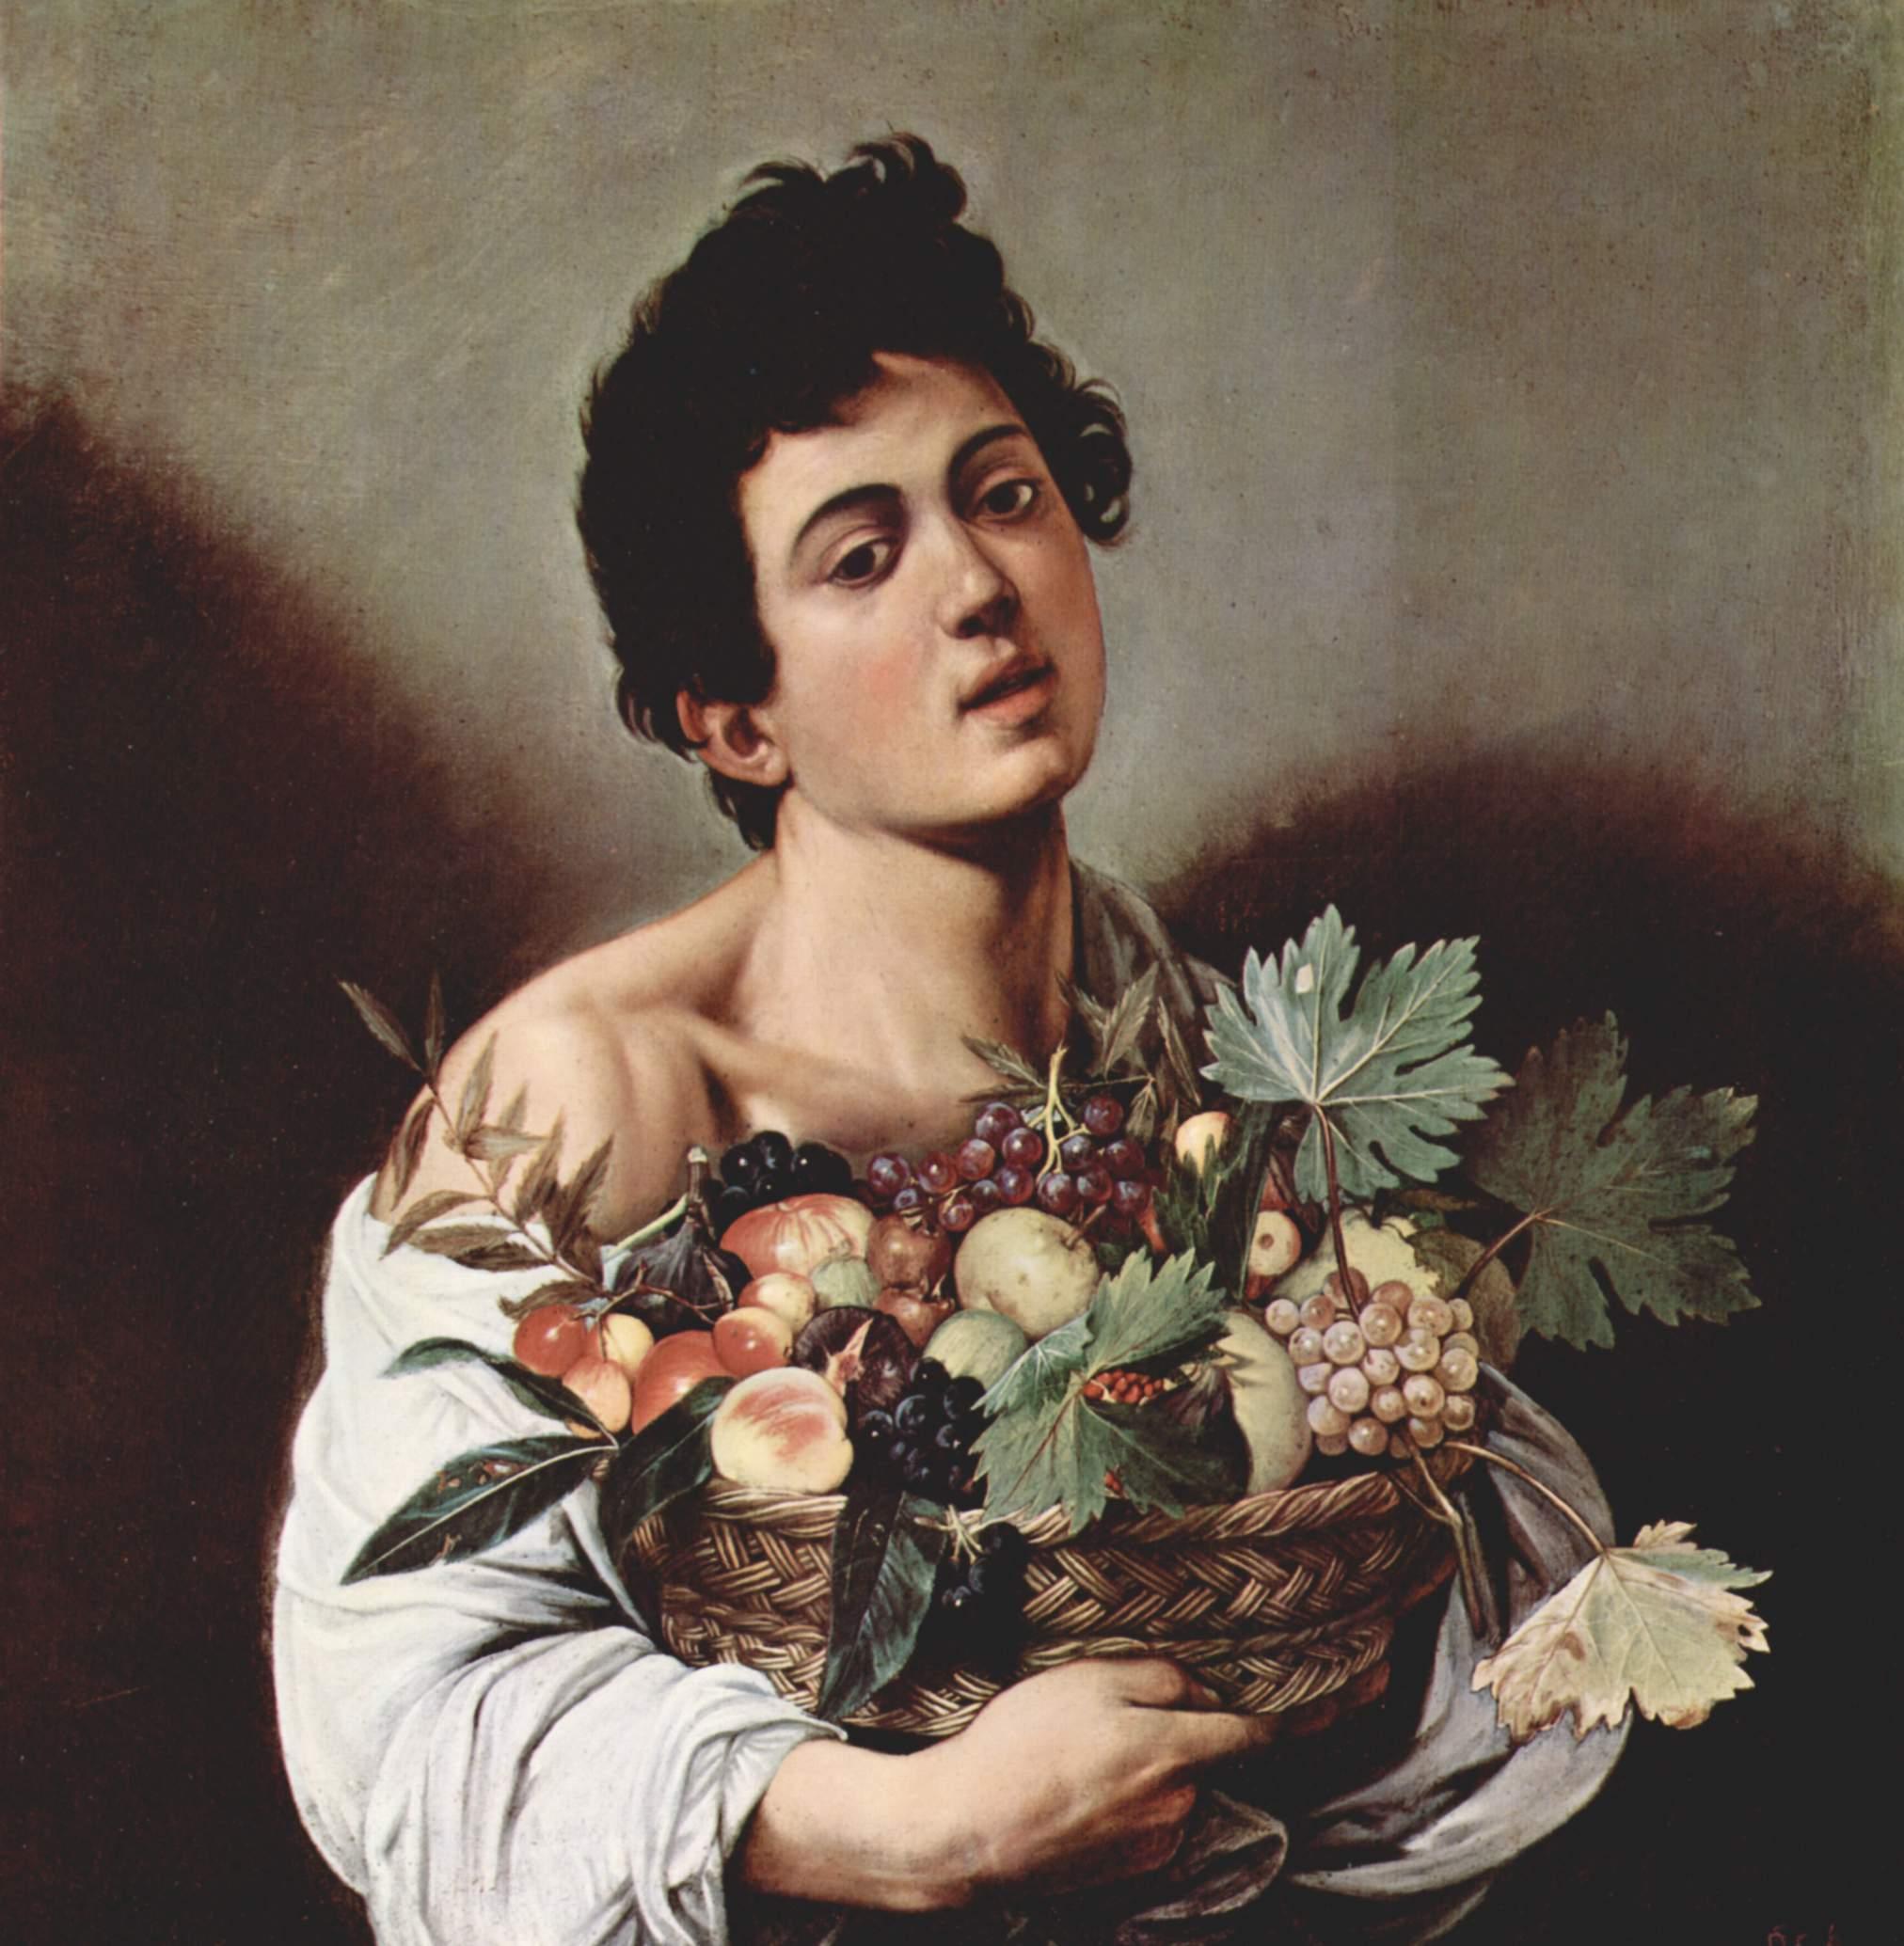 Юноща с корзиной фруктов, Микеланджело Меризи де Караваджо